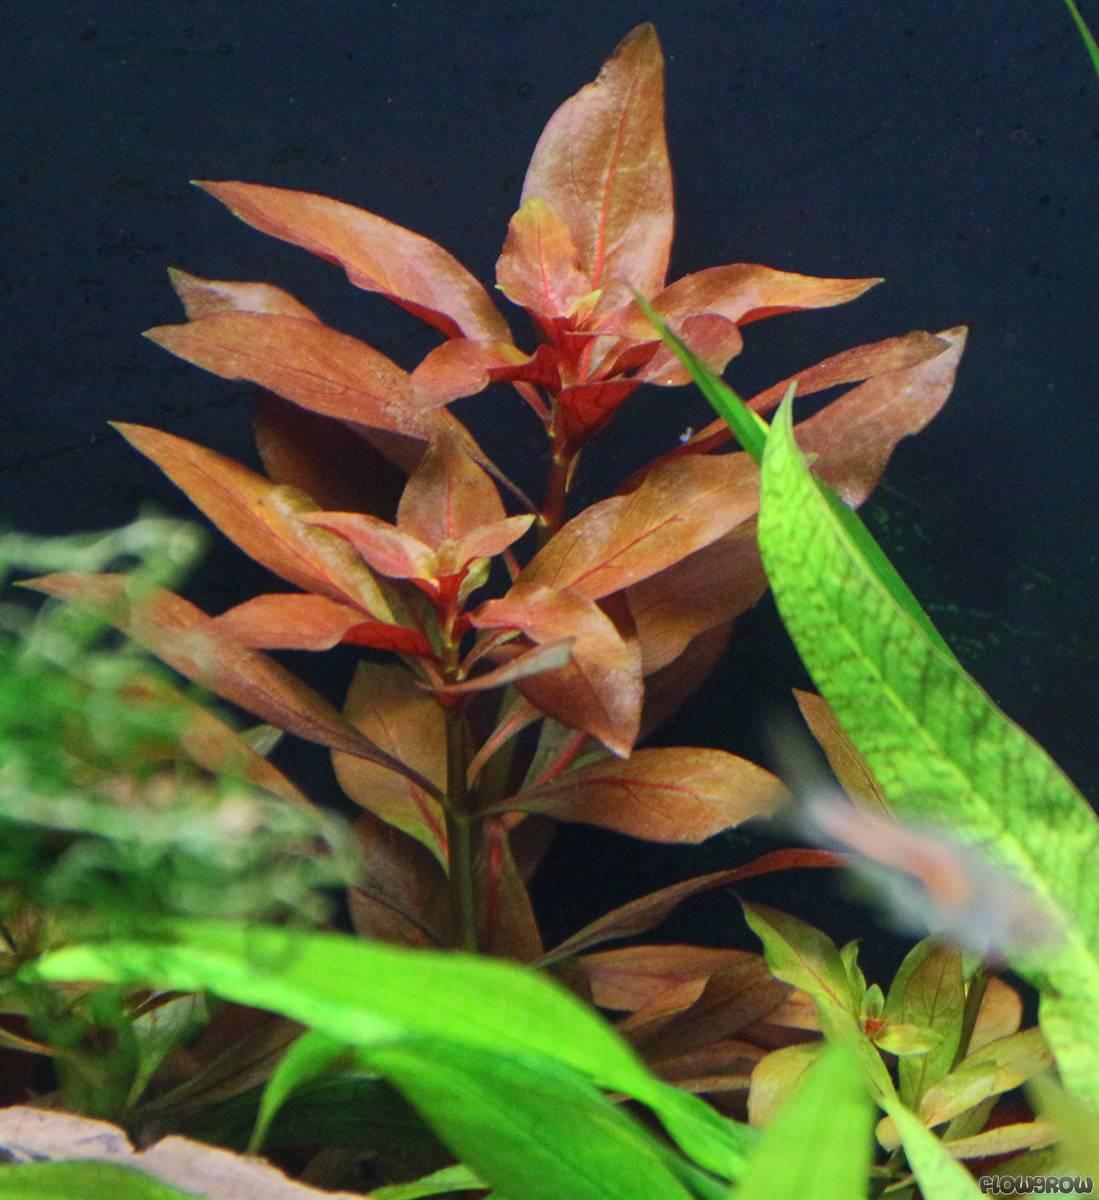 ludwigia rubin rubin ludwigie flowgrow wasserpflanzen datenbank. Black Bedroom Furniture Sets. Home Design Ideas